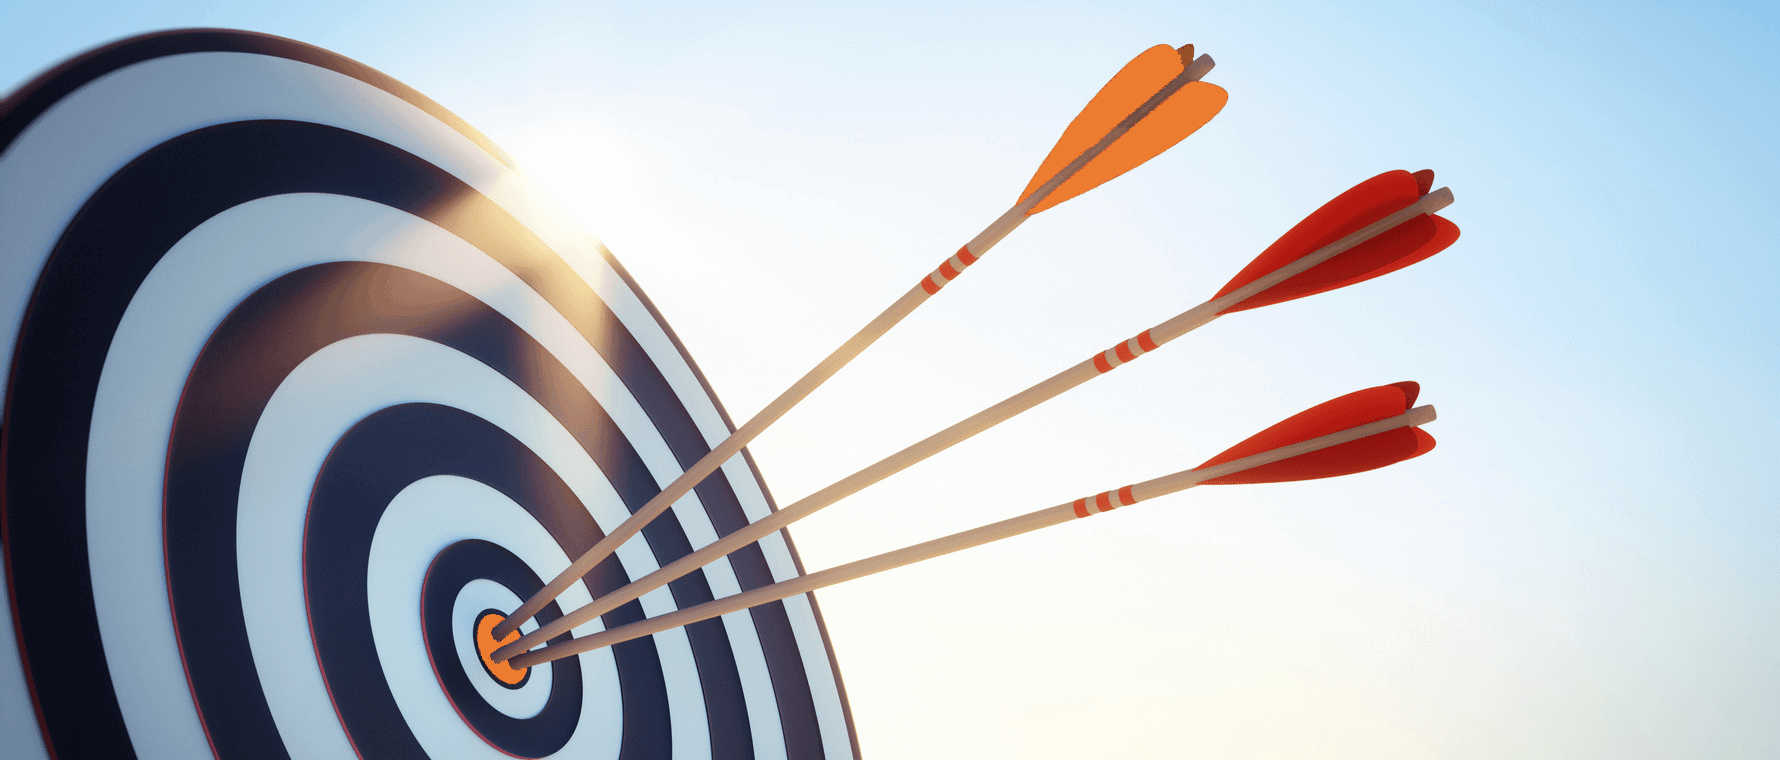 Mit Ausdauer zu langfristigem Erfolg © Fotolia 2015 psdesign1